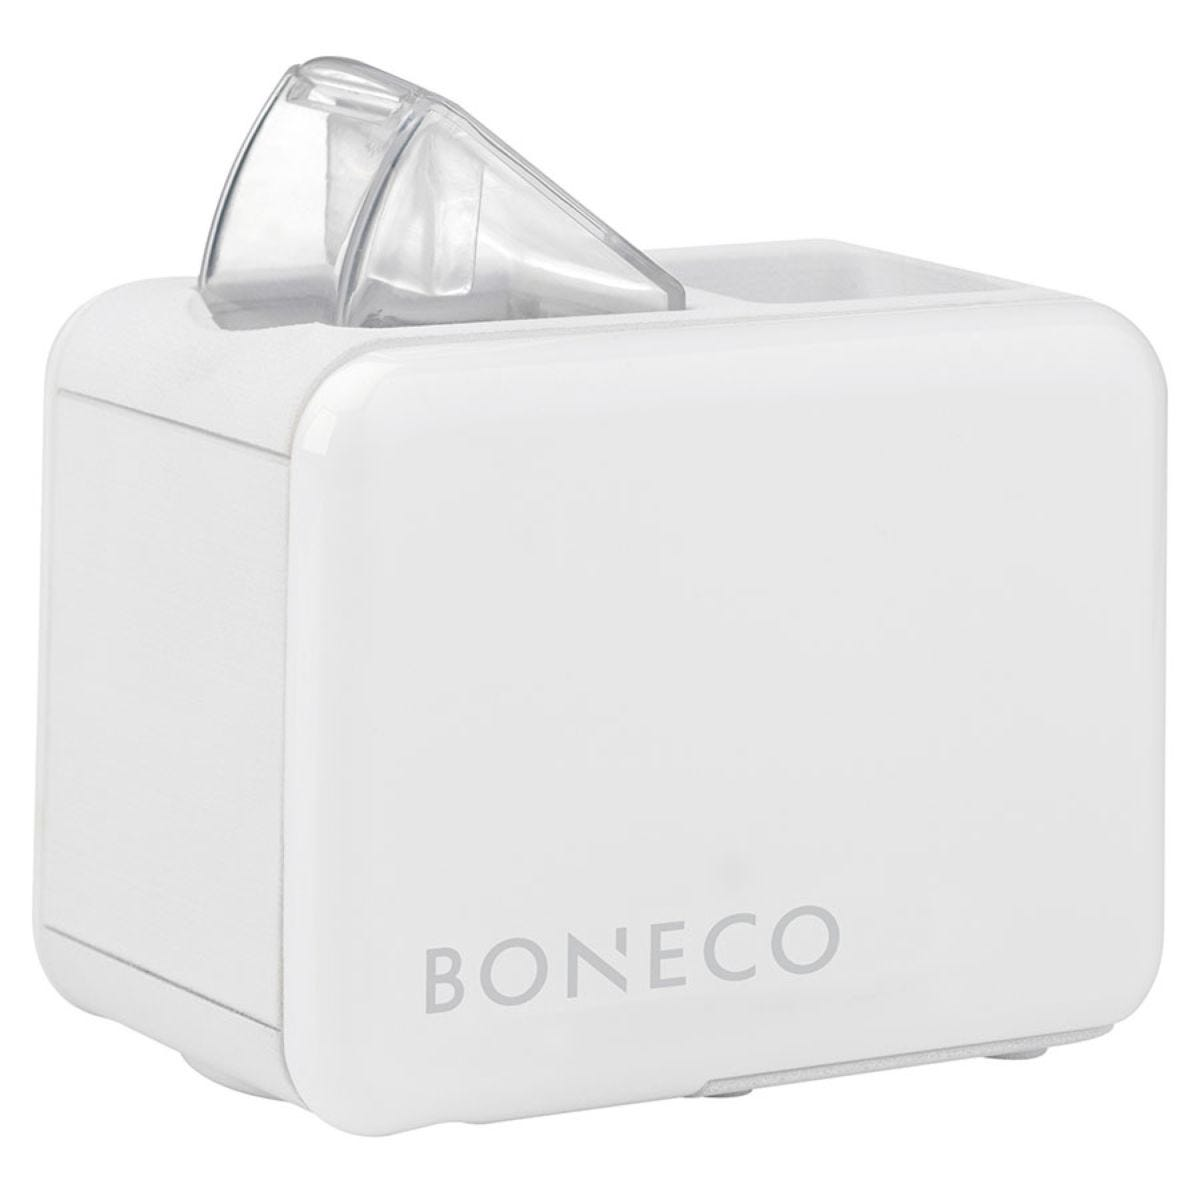 Boneco U7146 Ultrasonic Compact Travel Air Humidifier